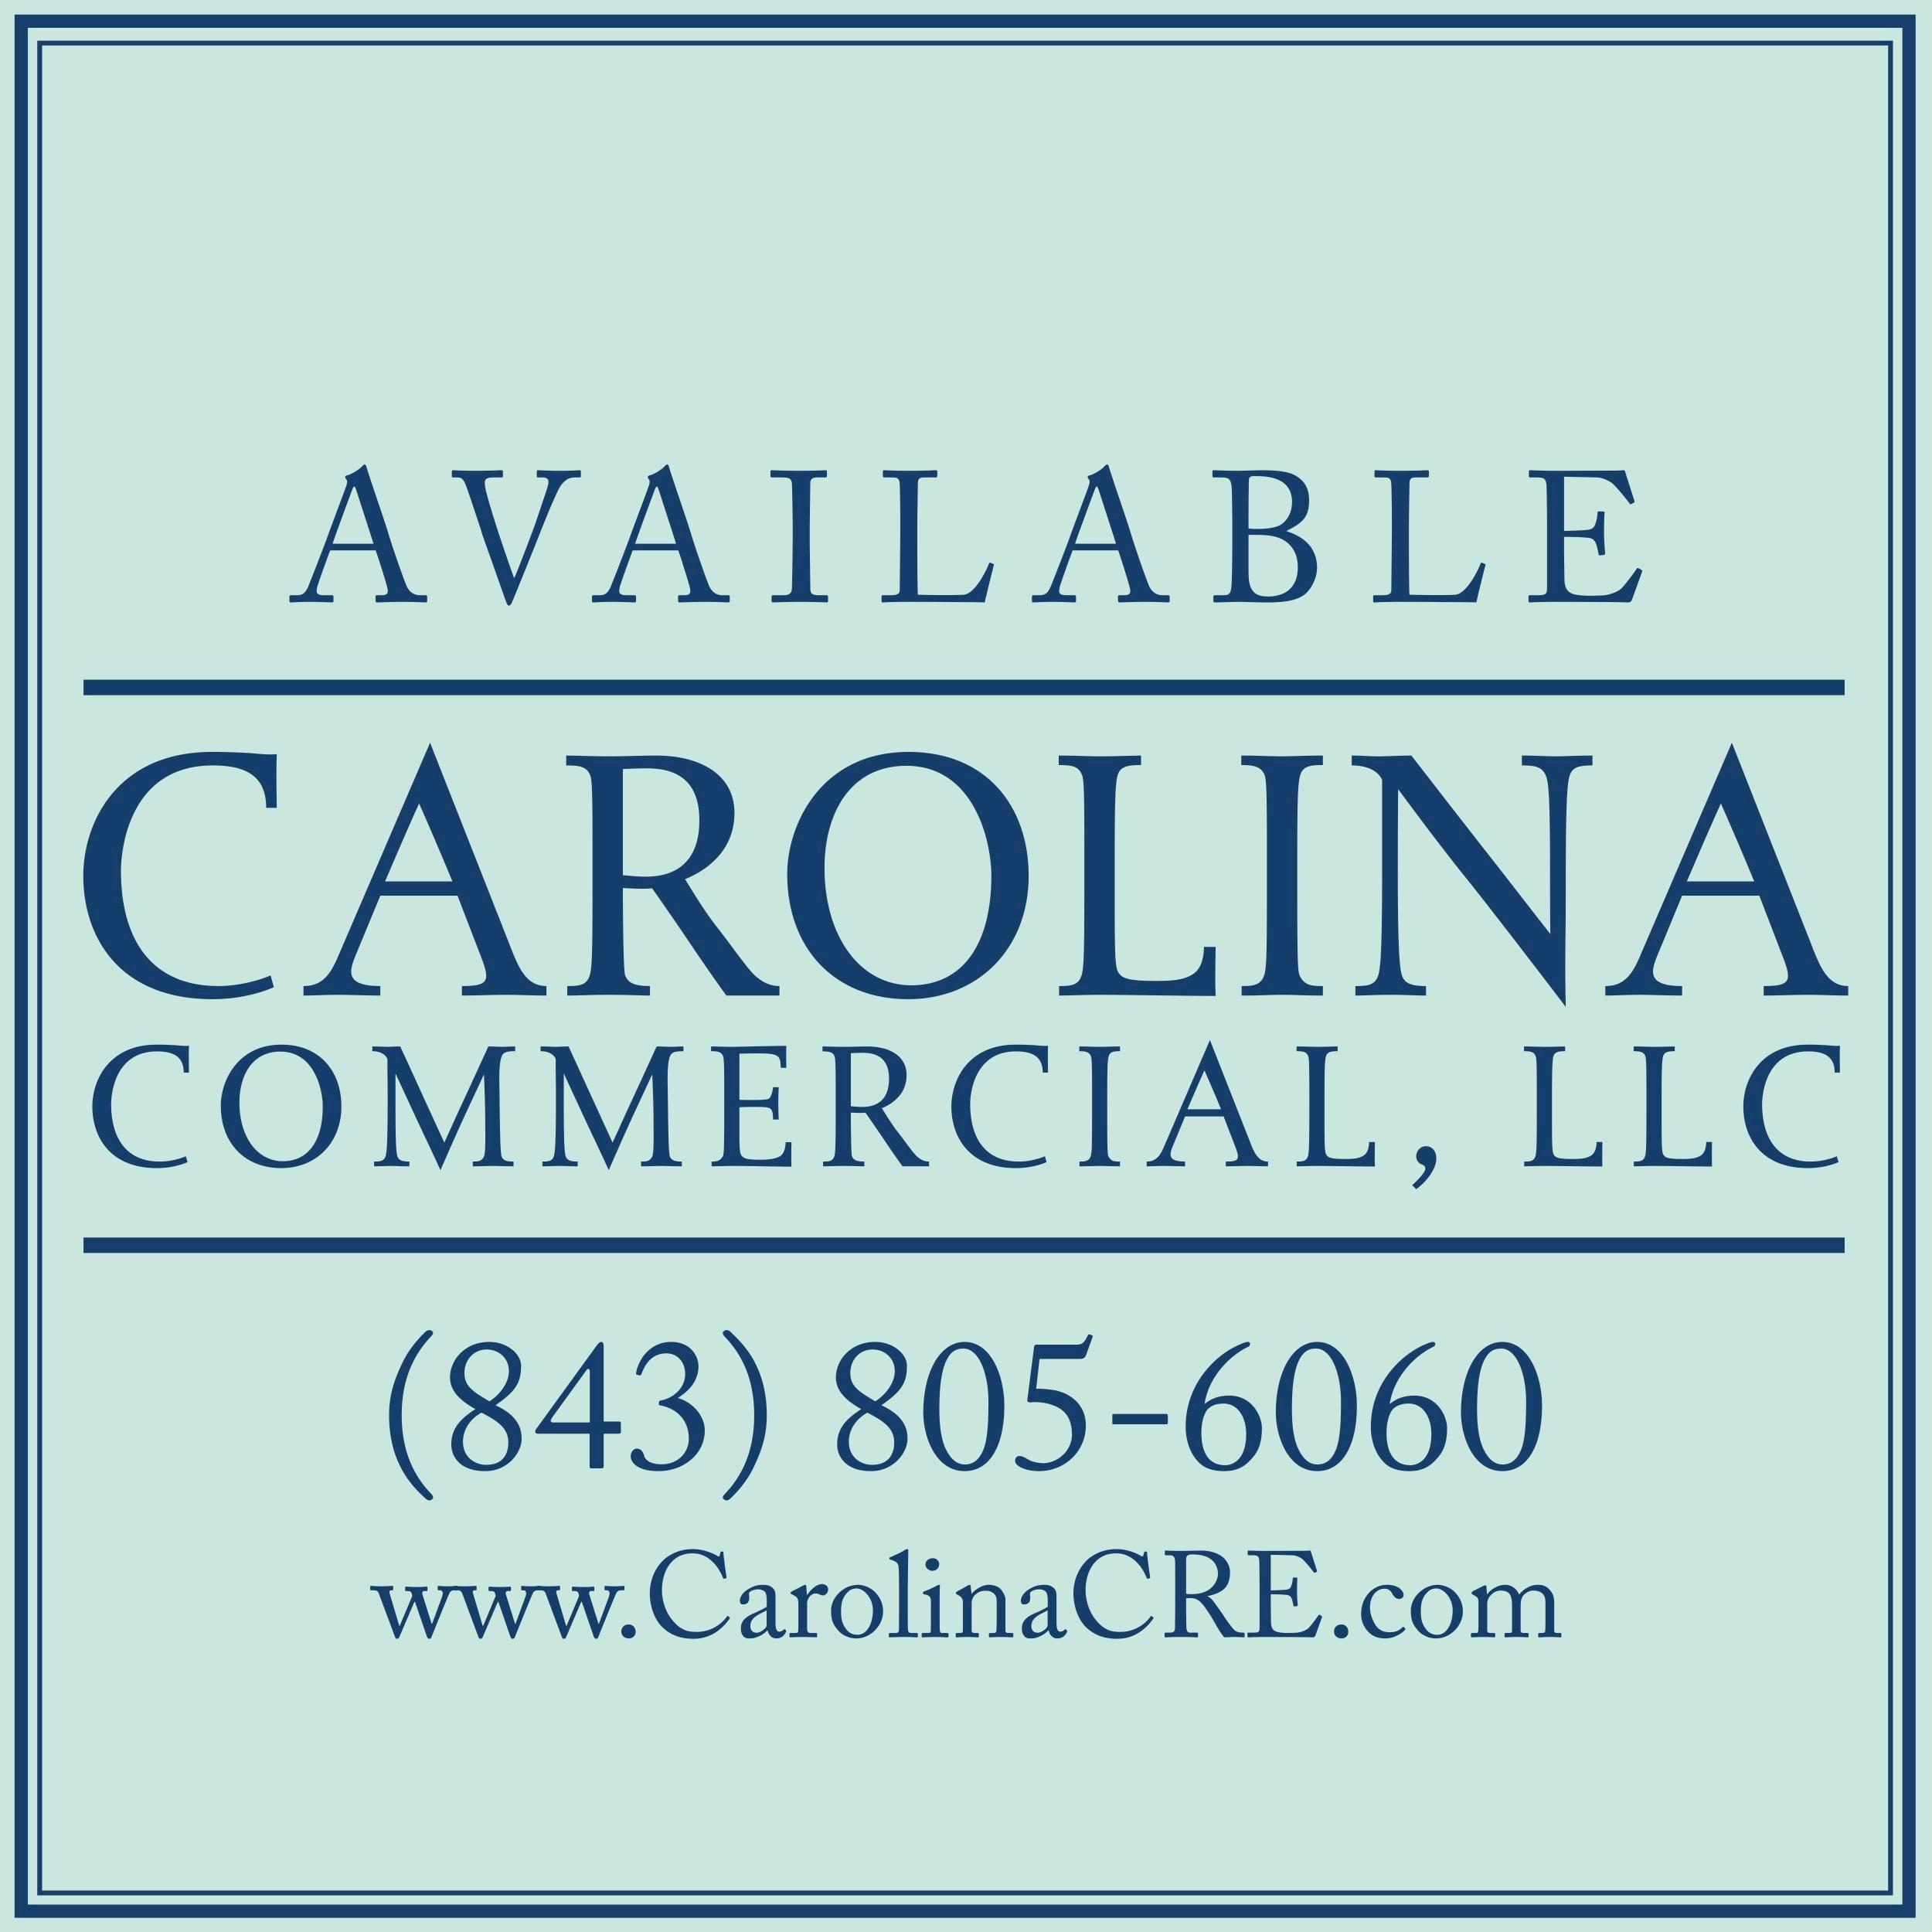 Carolina Commercial, LLC